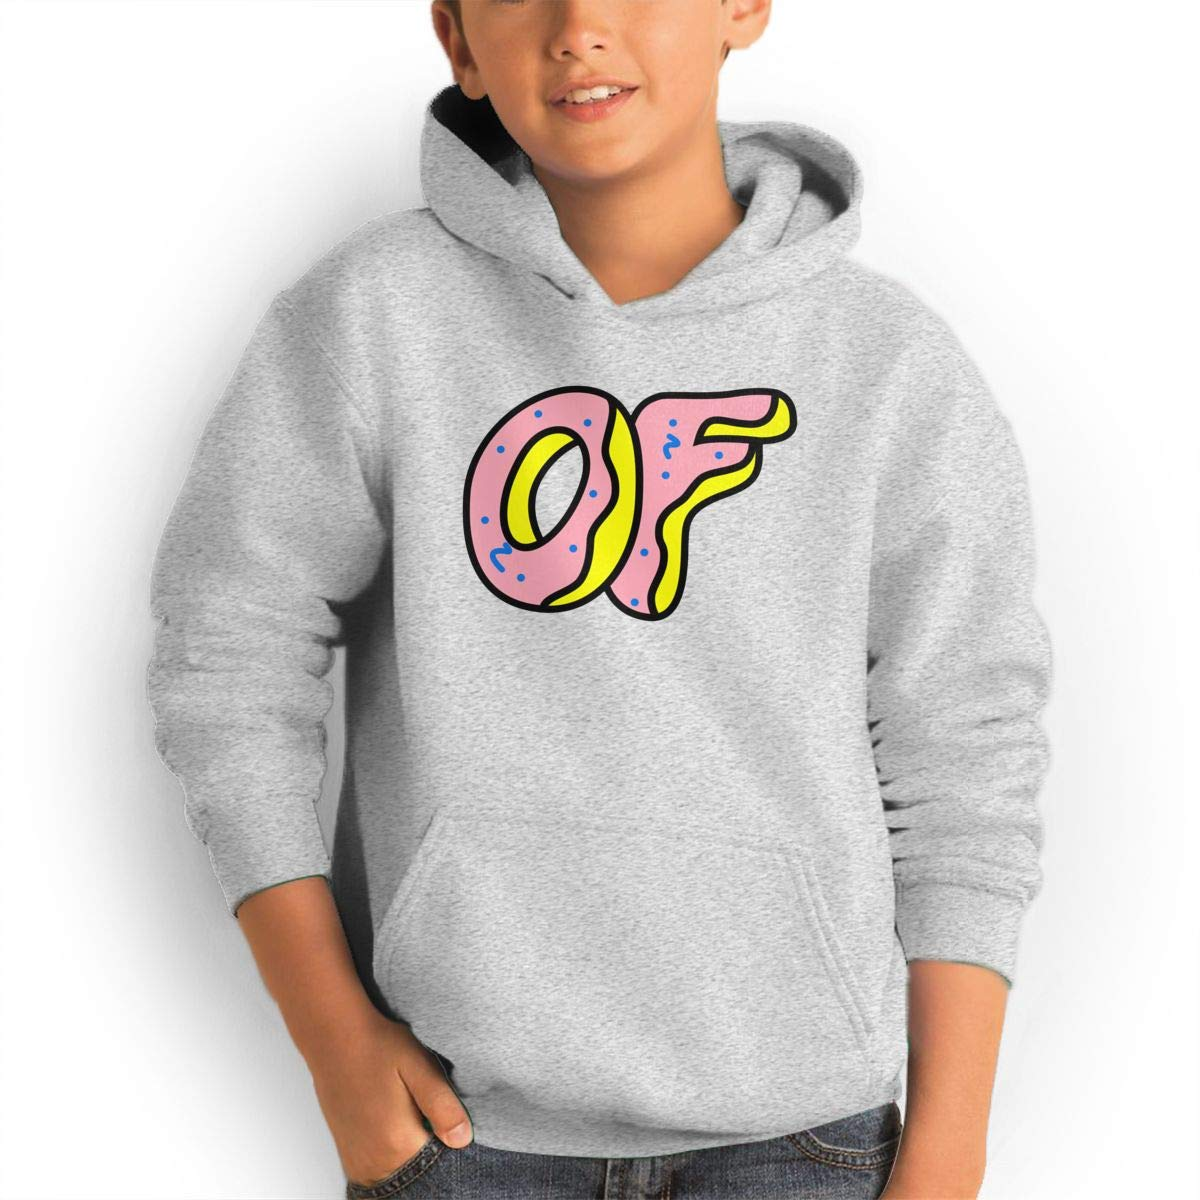 Neloha Teen S Odd Future Donut Logo Grey Hooded Cool Aesthetic Pullover H Shirts